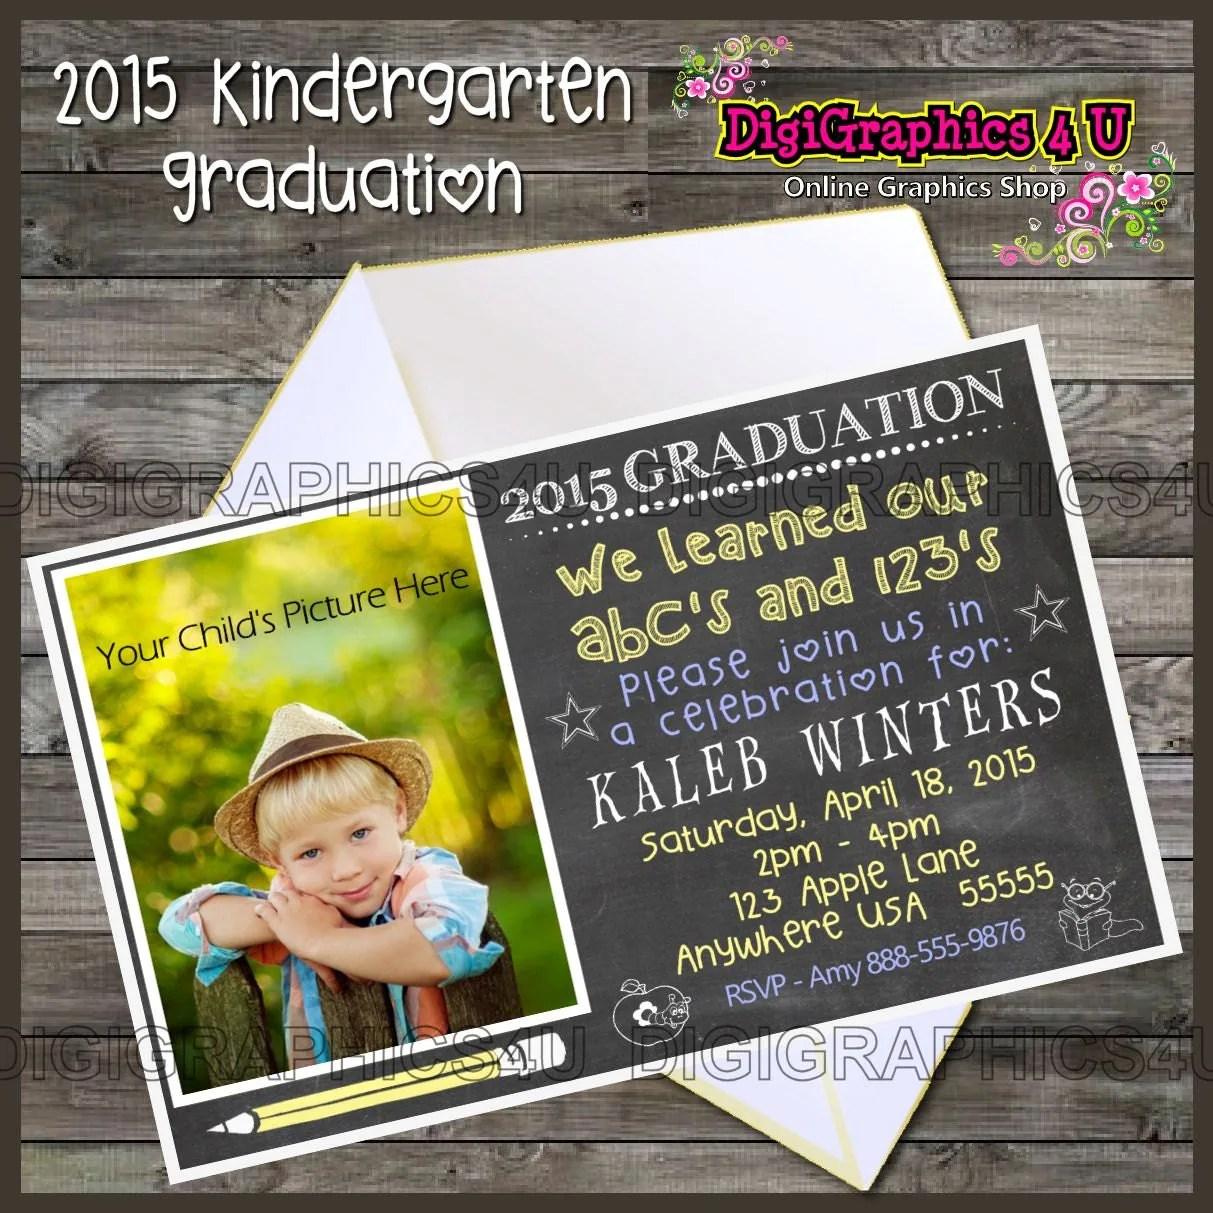 Printable Kindergarten Graduation Party By Digigraphics4u